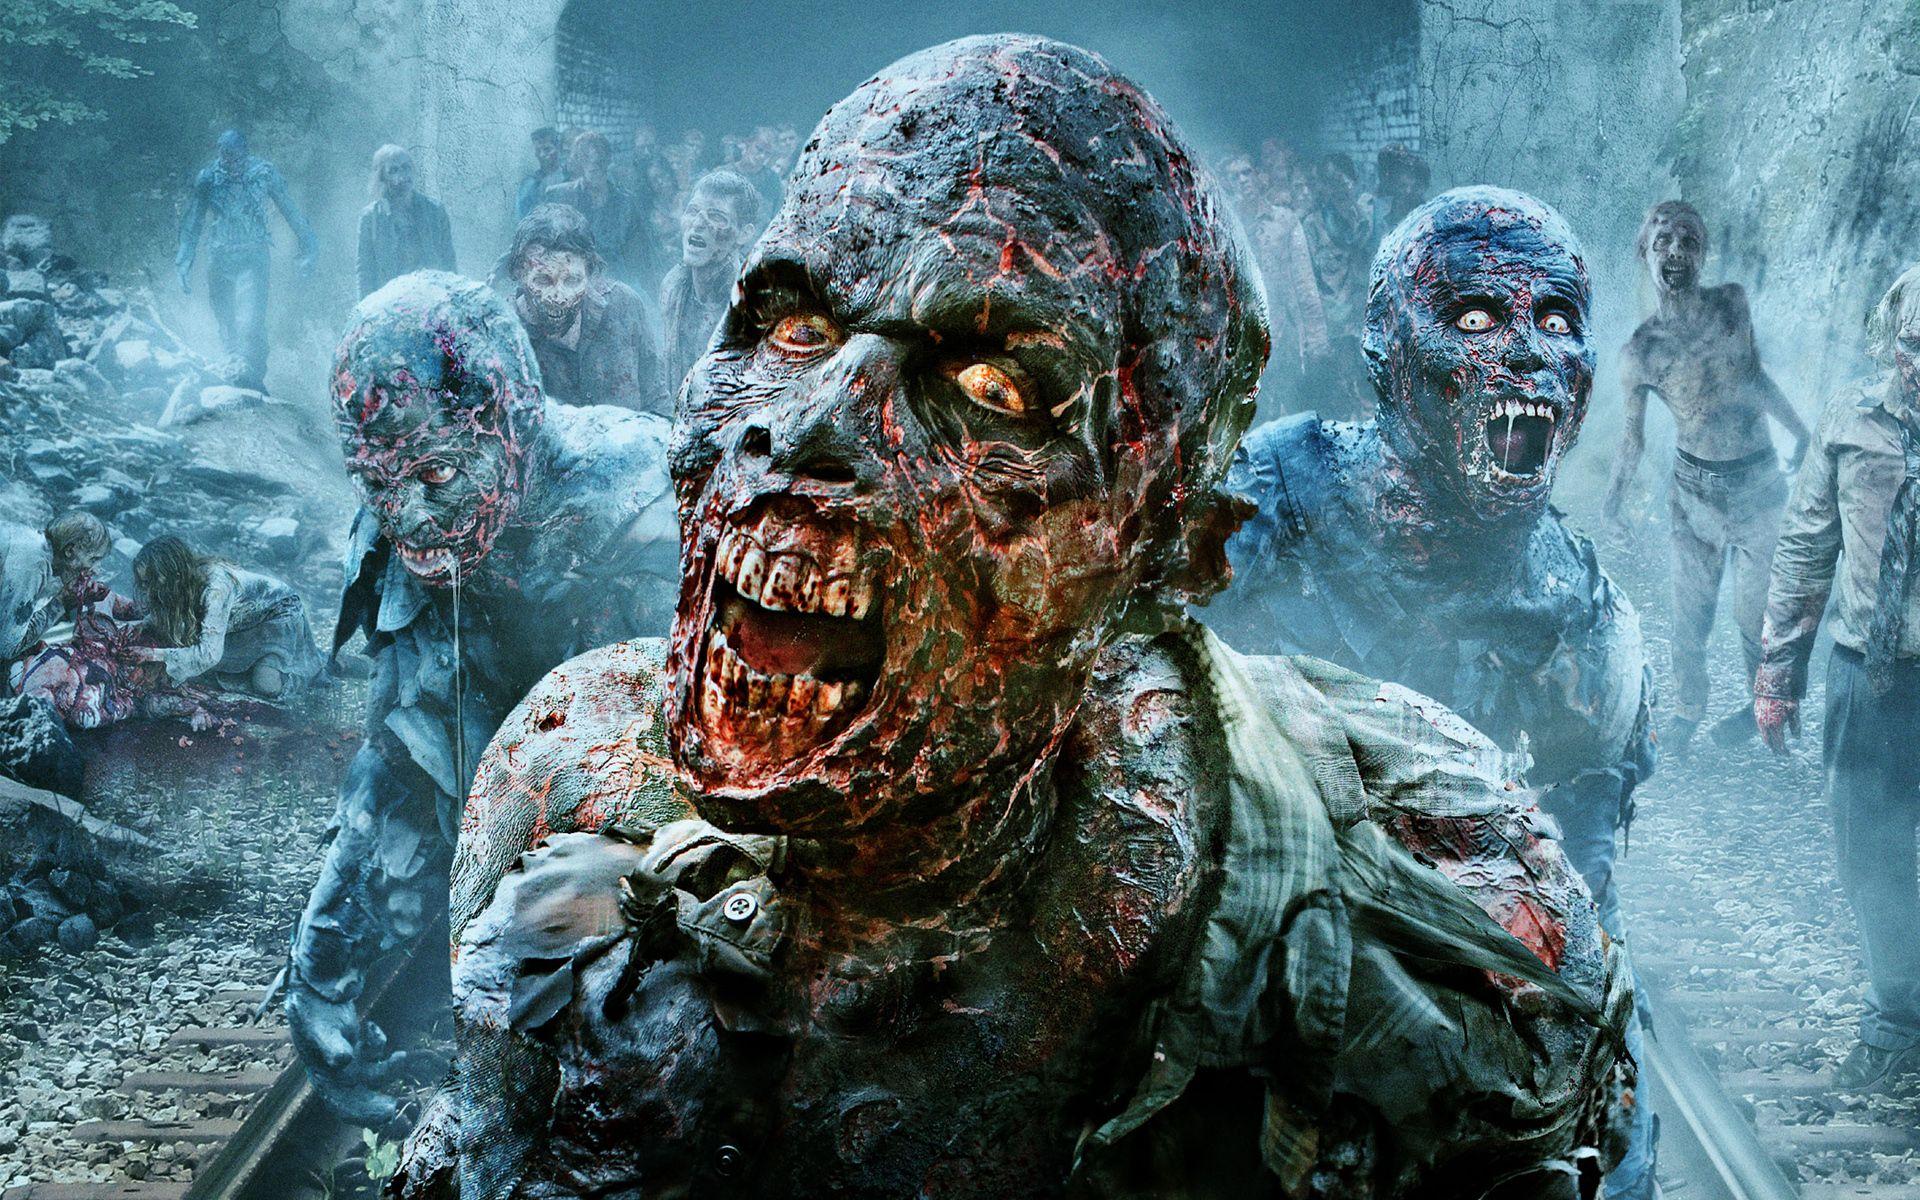 The Walking Dead Zombies Scary wallpaper Scary wallpaper